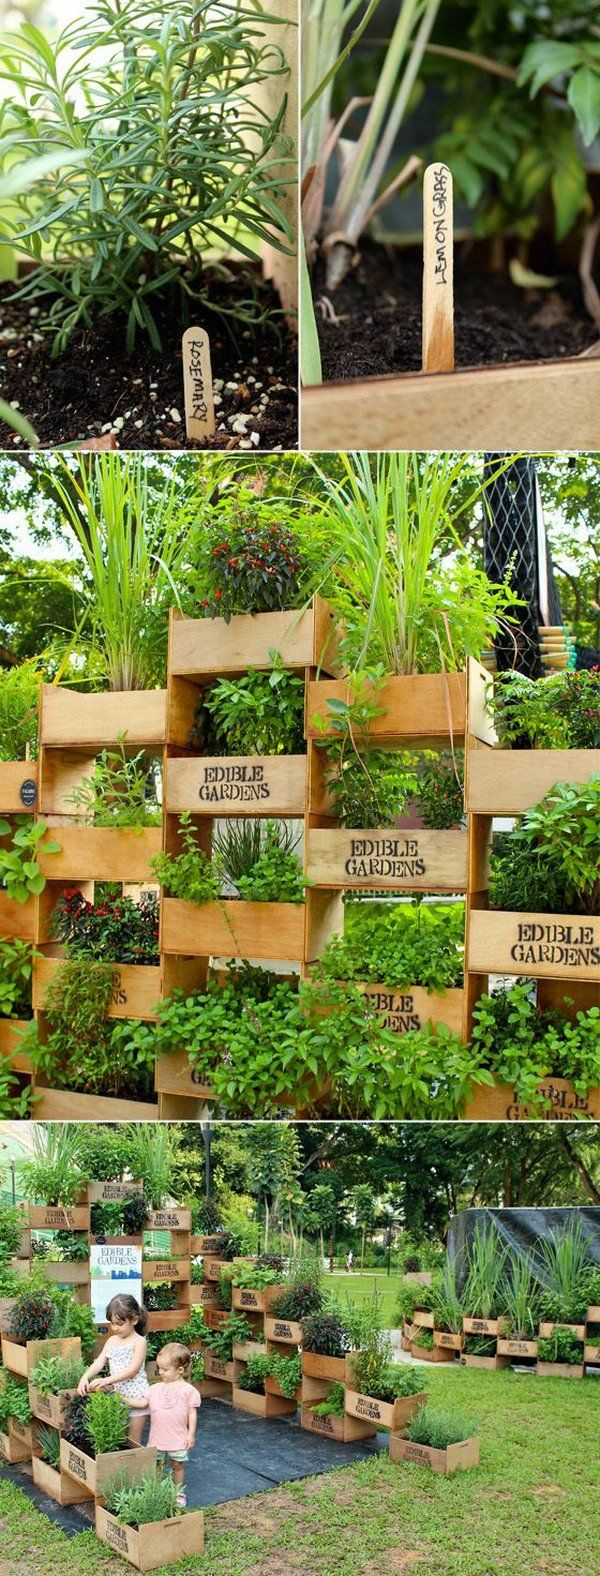 20 cool vertical gardening ideas edible garden garden projects